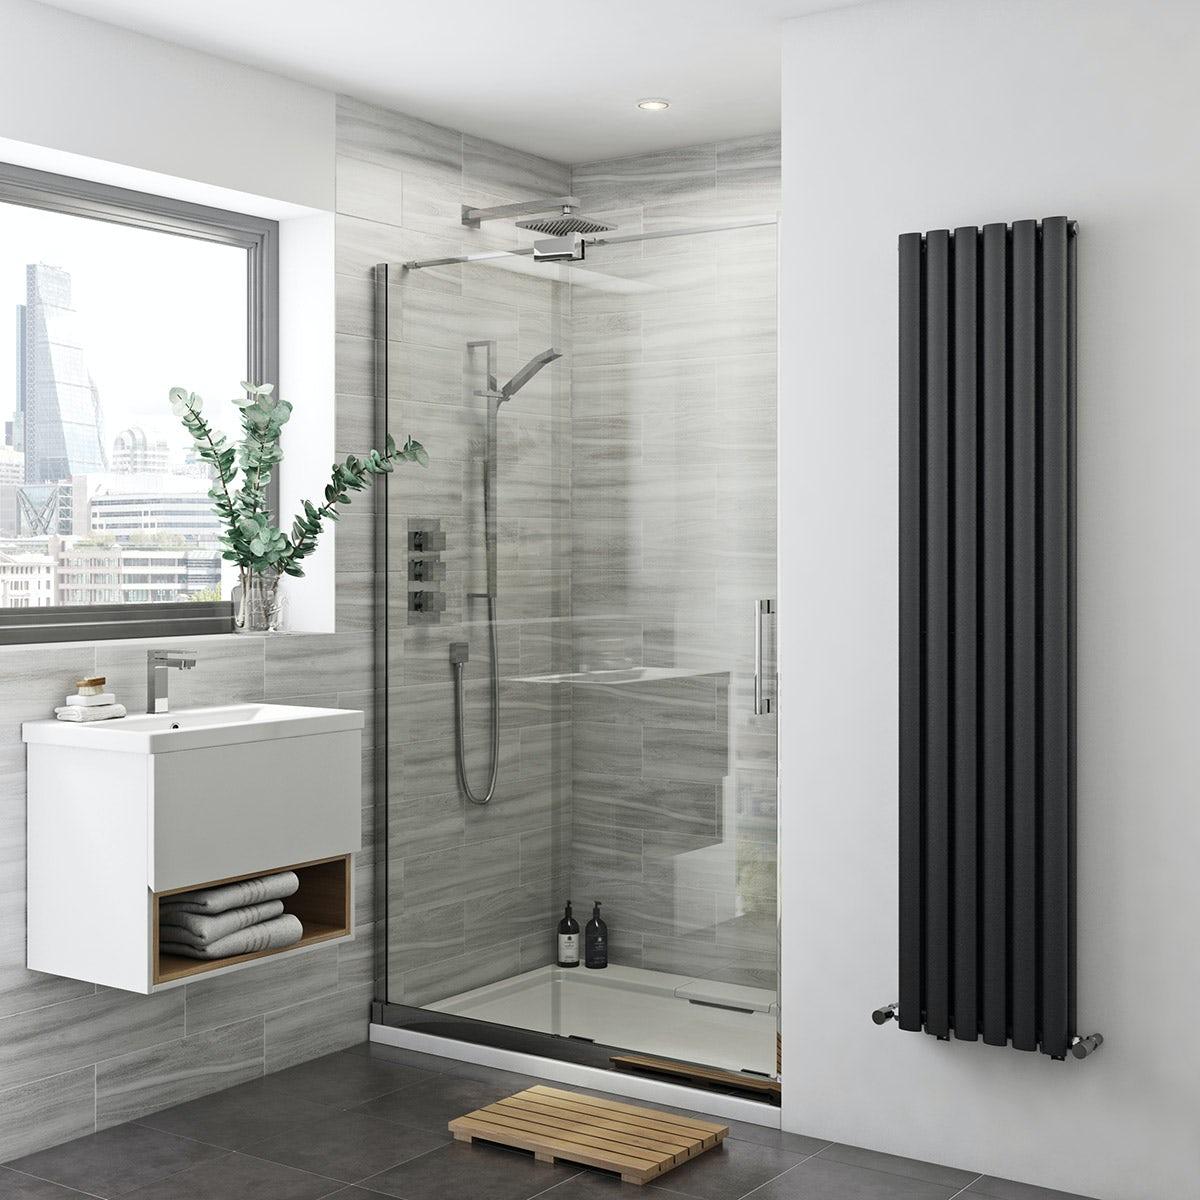 Mode Carter premium 8mm easy clean left handed sliding shower door 1200mm